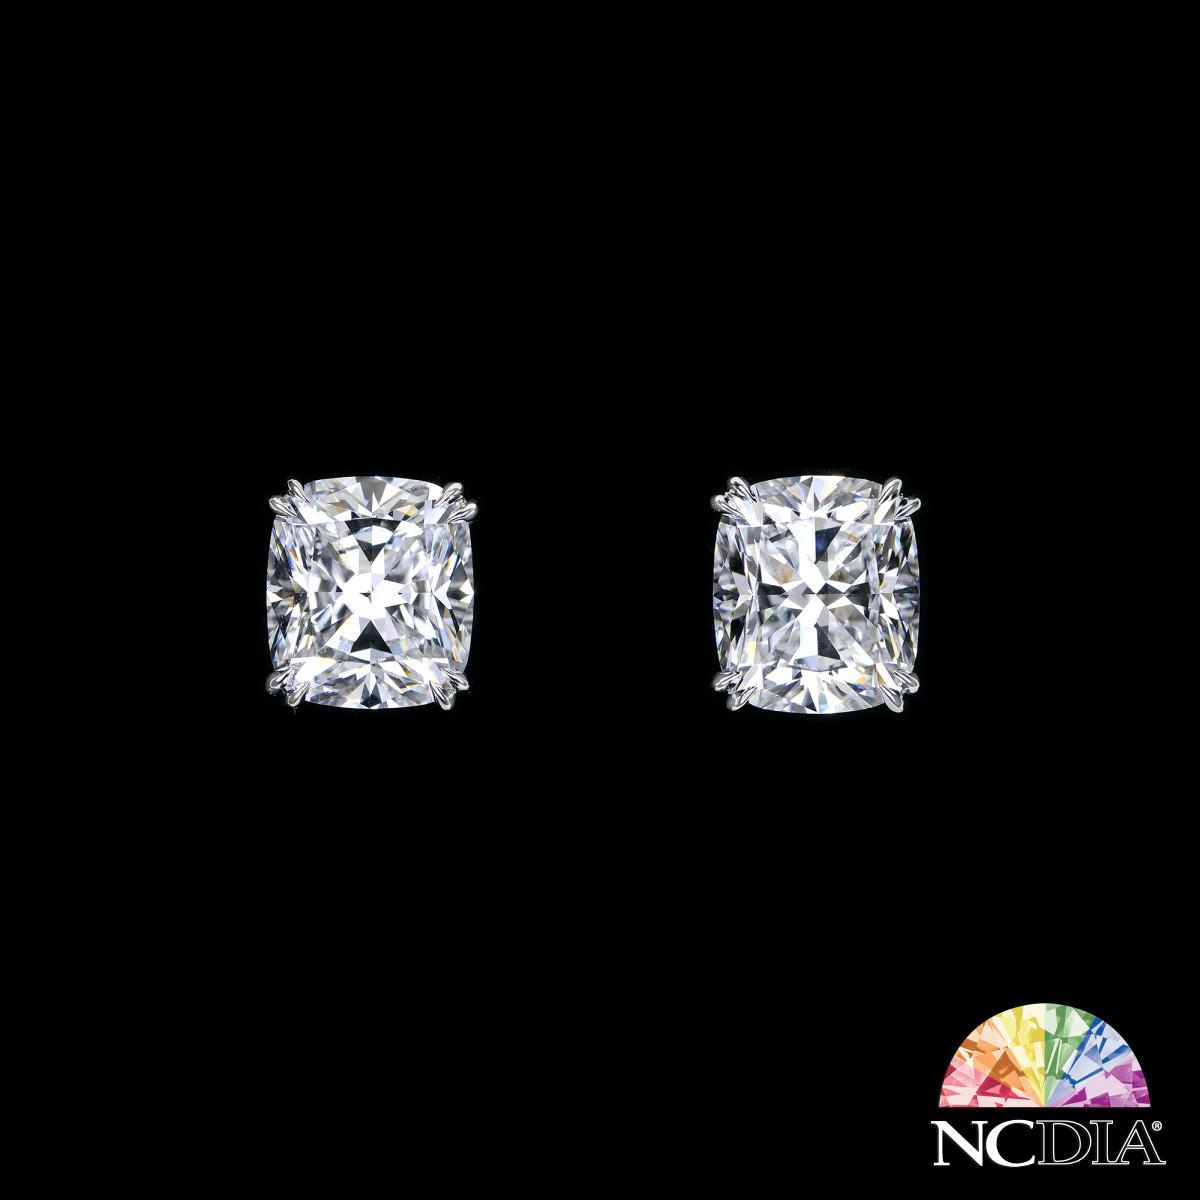 Over 5 cts ea E VVS2 Cushion Cut Diamond Studs, GIA reports available